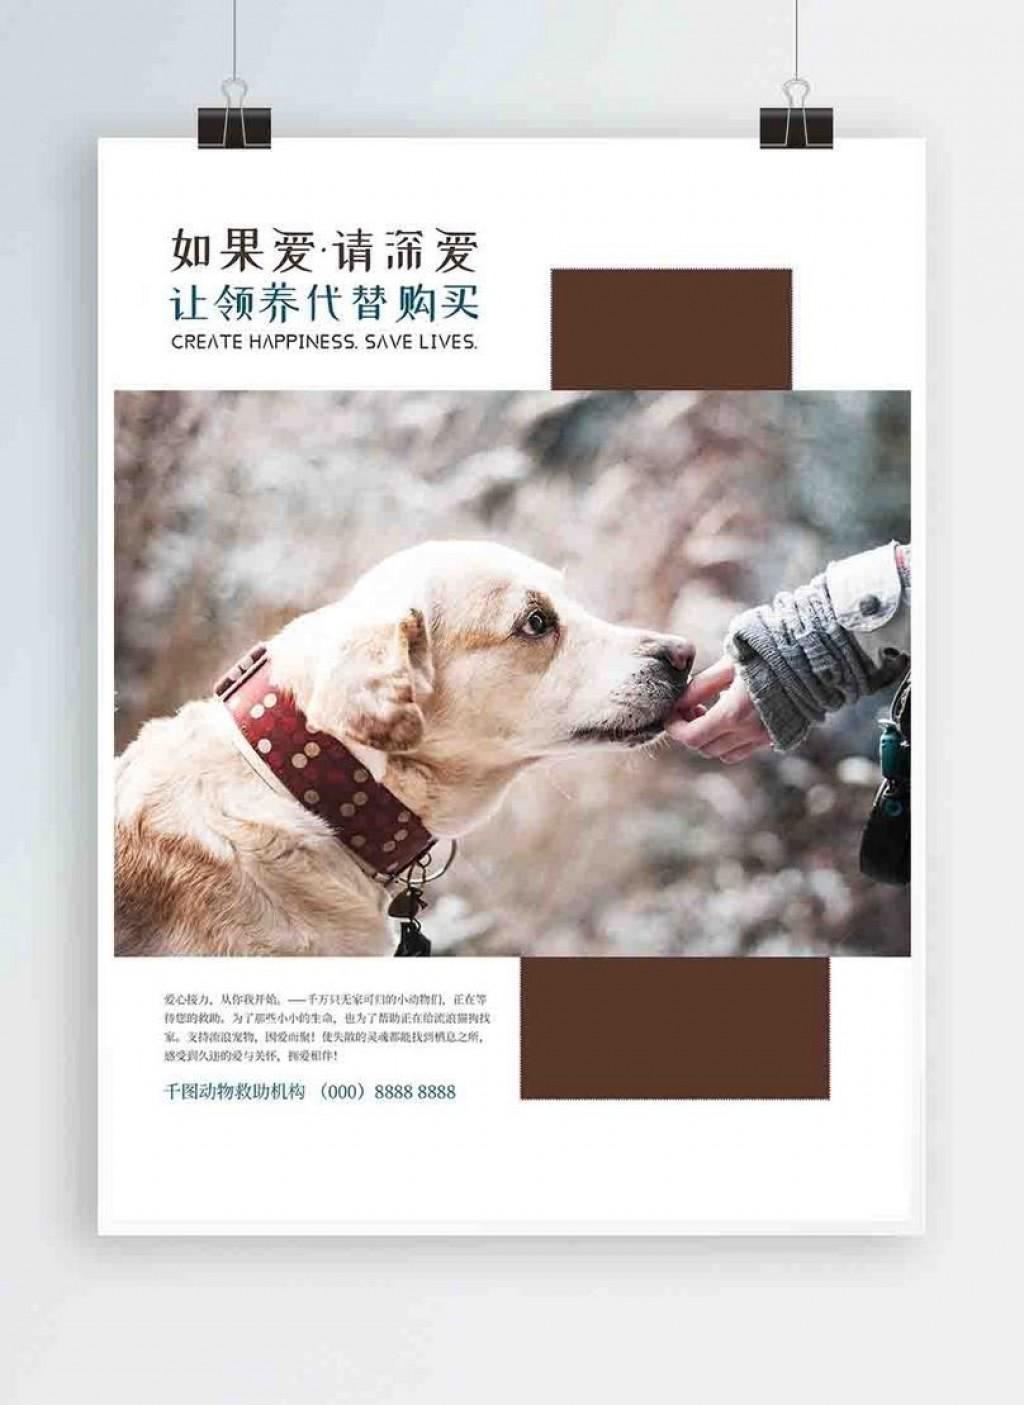 004 Imposing Pet Adoption Flyer Template High Definition  Free Event DogLarge